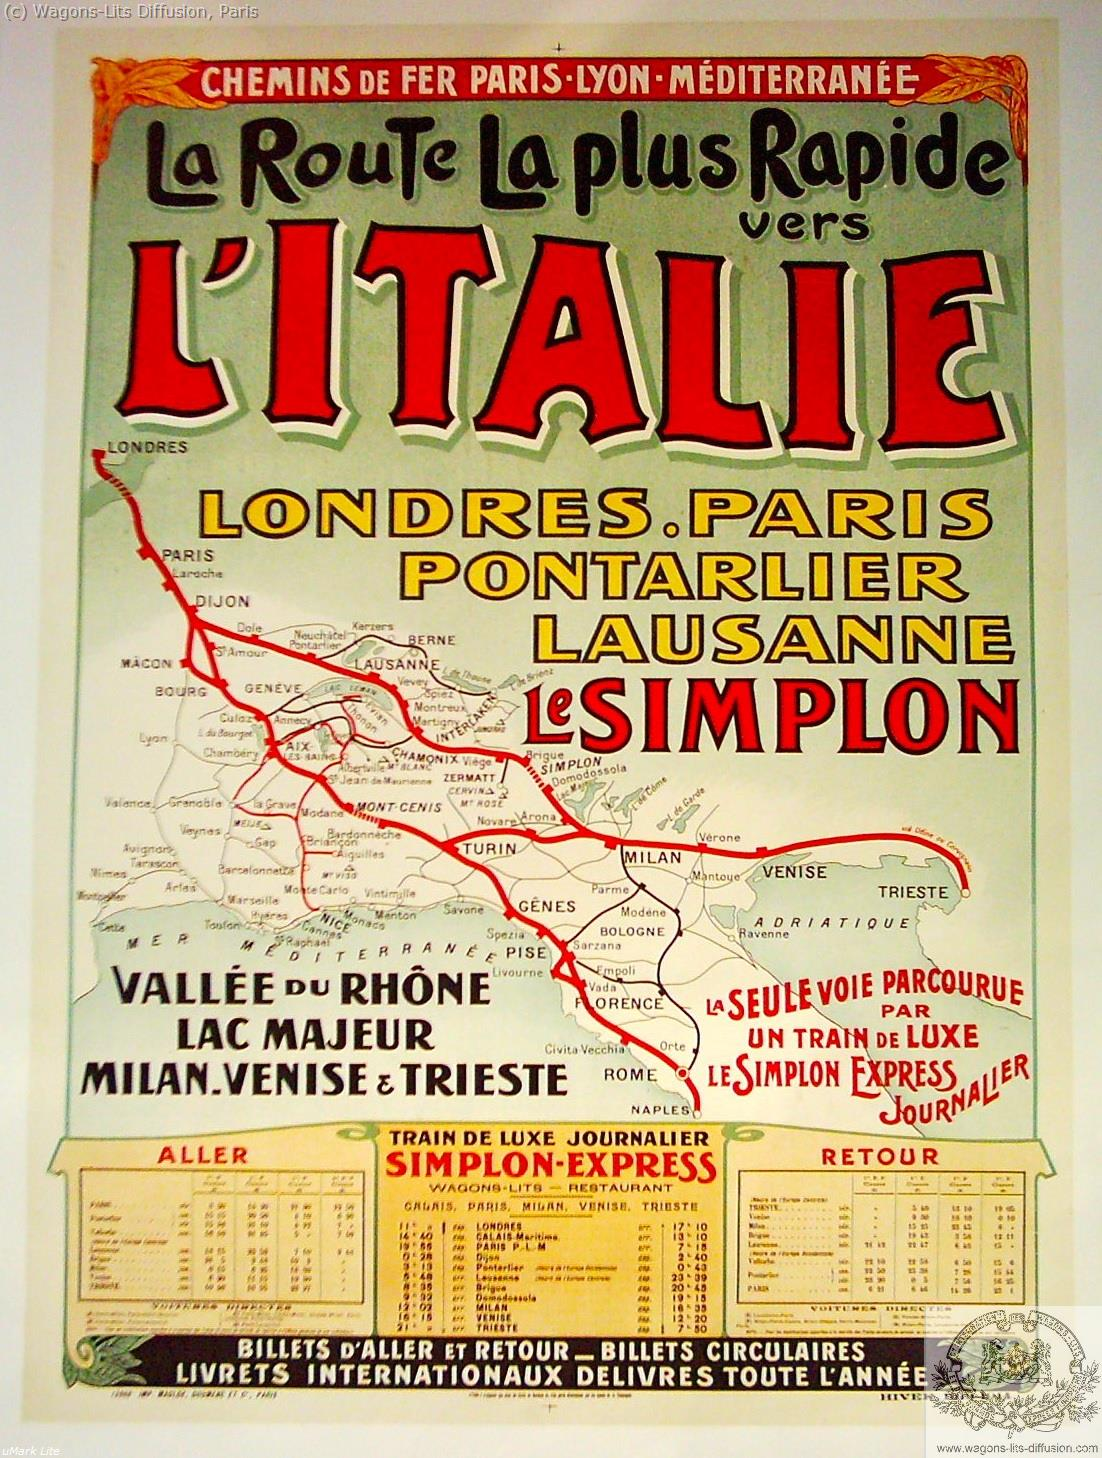 PLM Italie Route la plus rapide Ref 1115